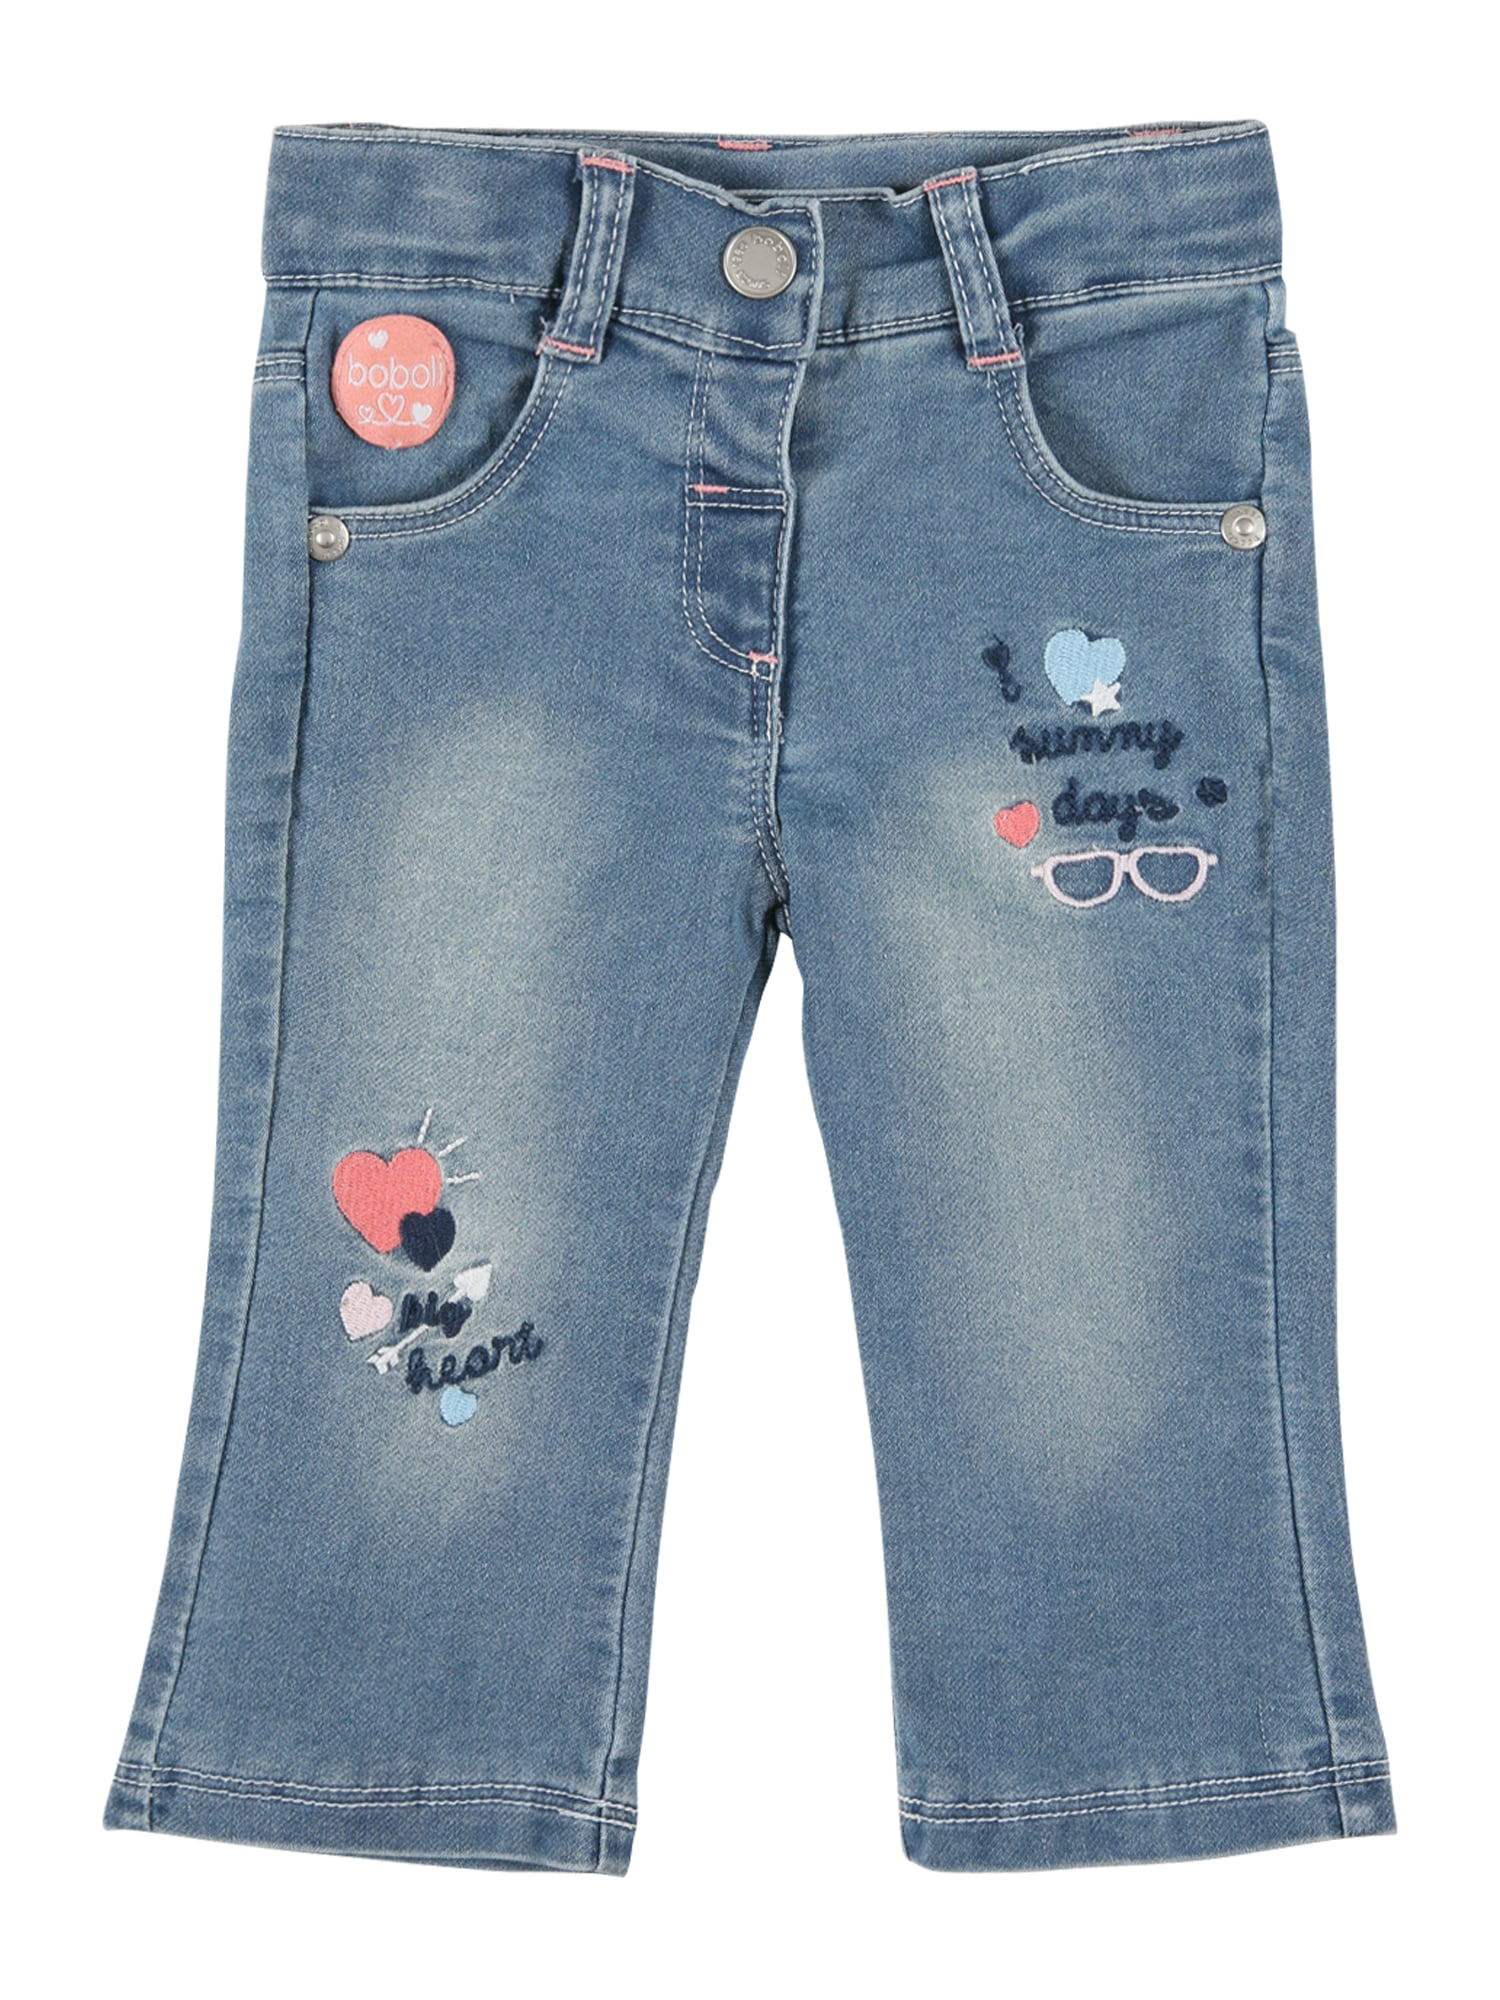 Boboli Džinsai tamsiai (džinso) mėlyna